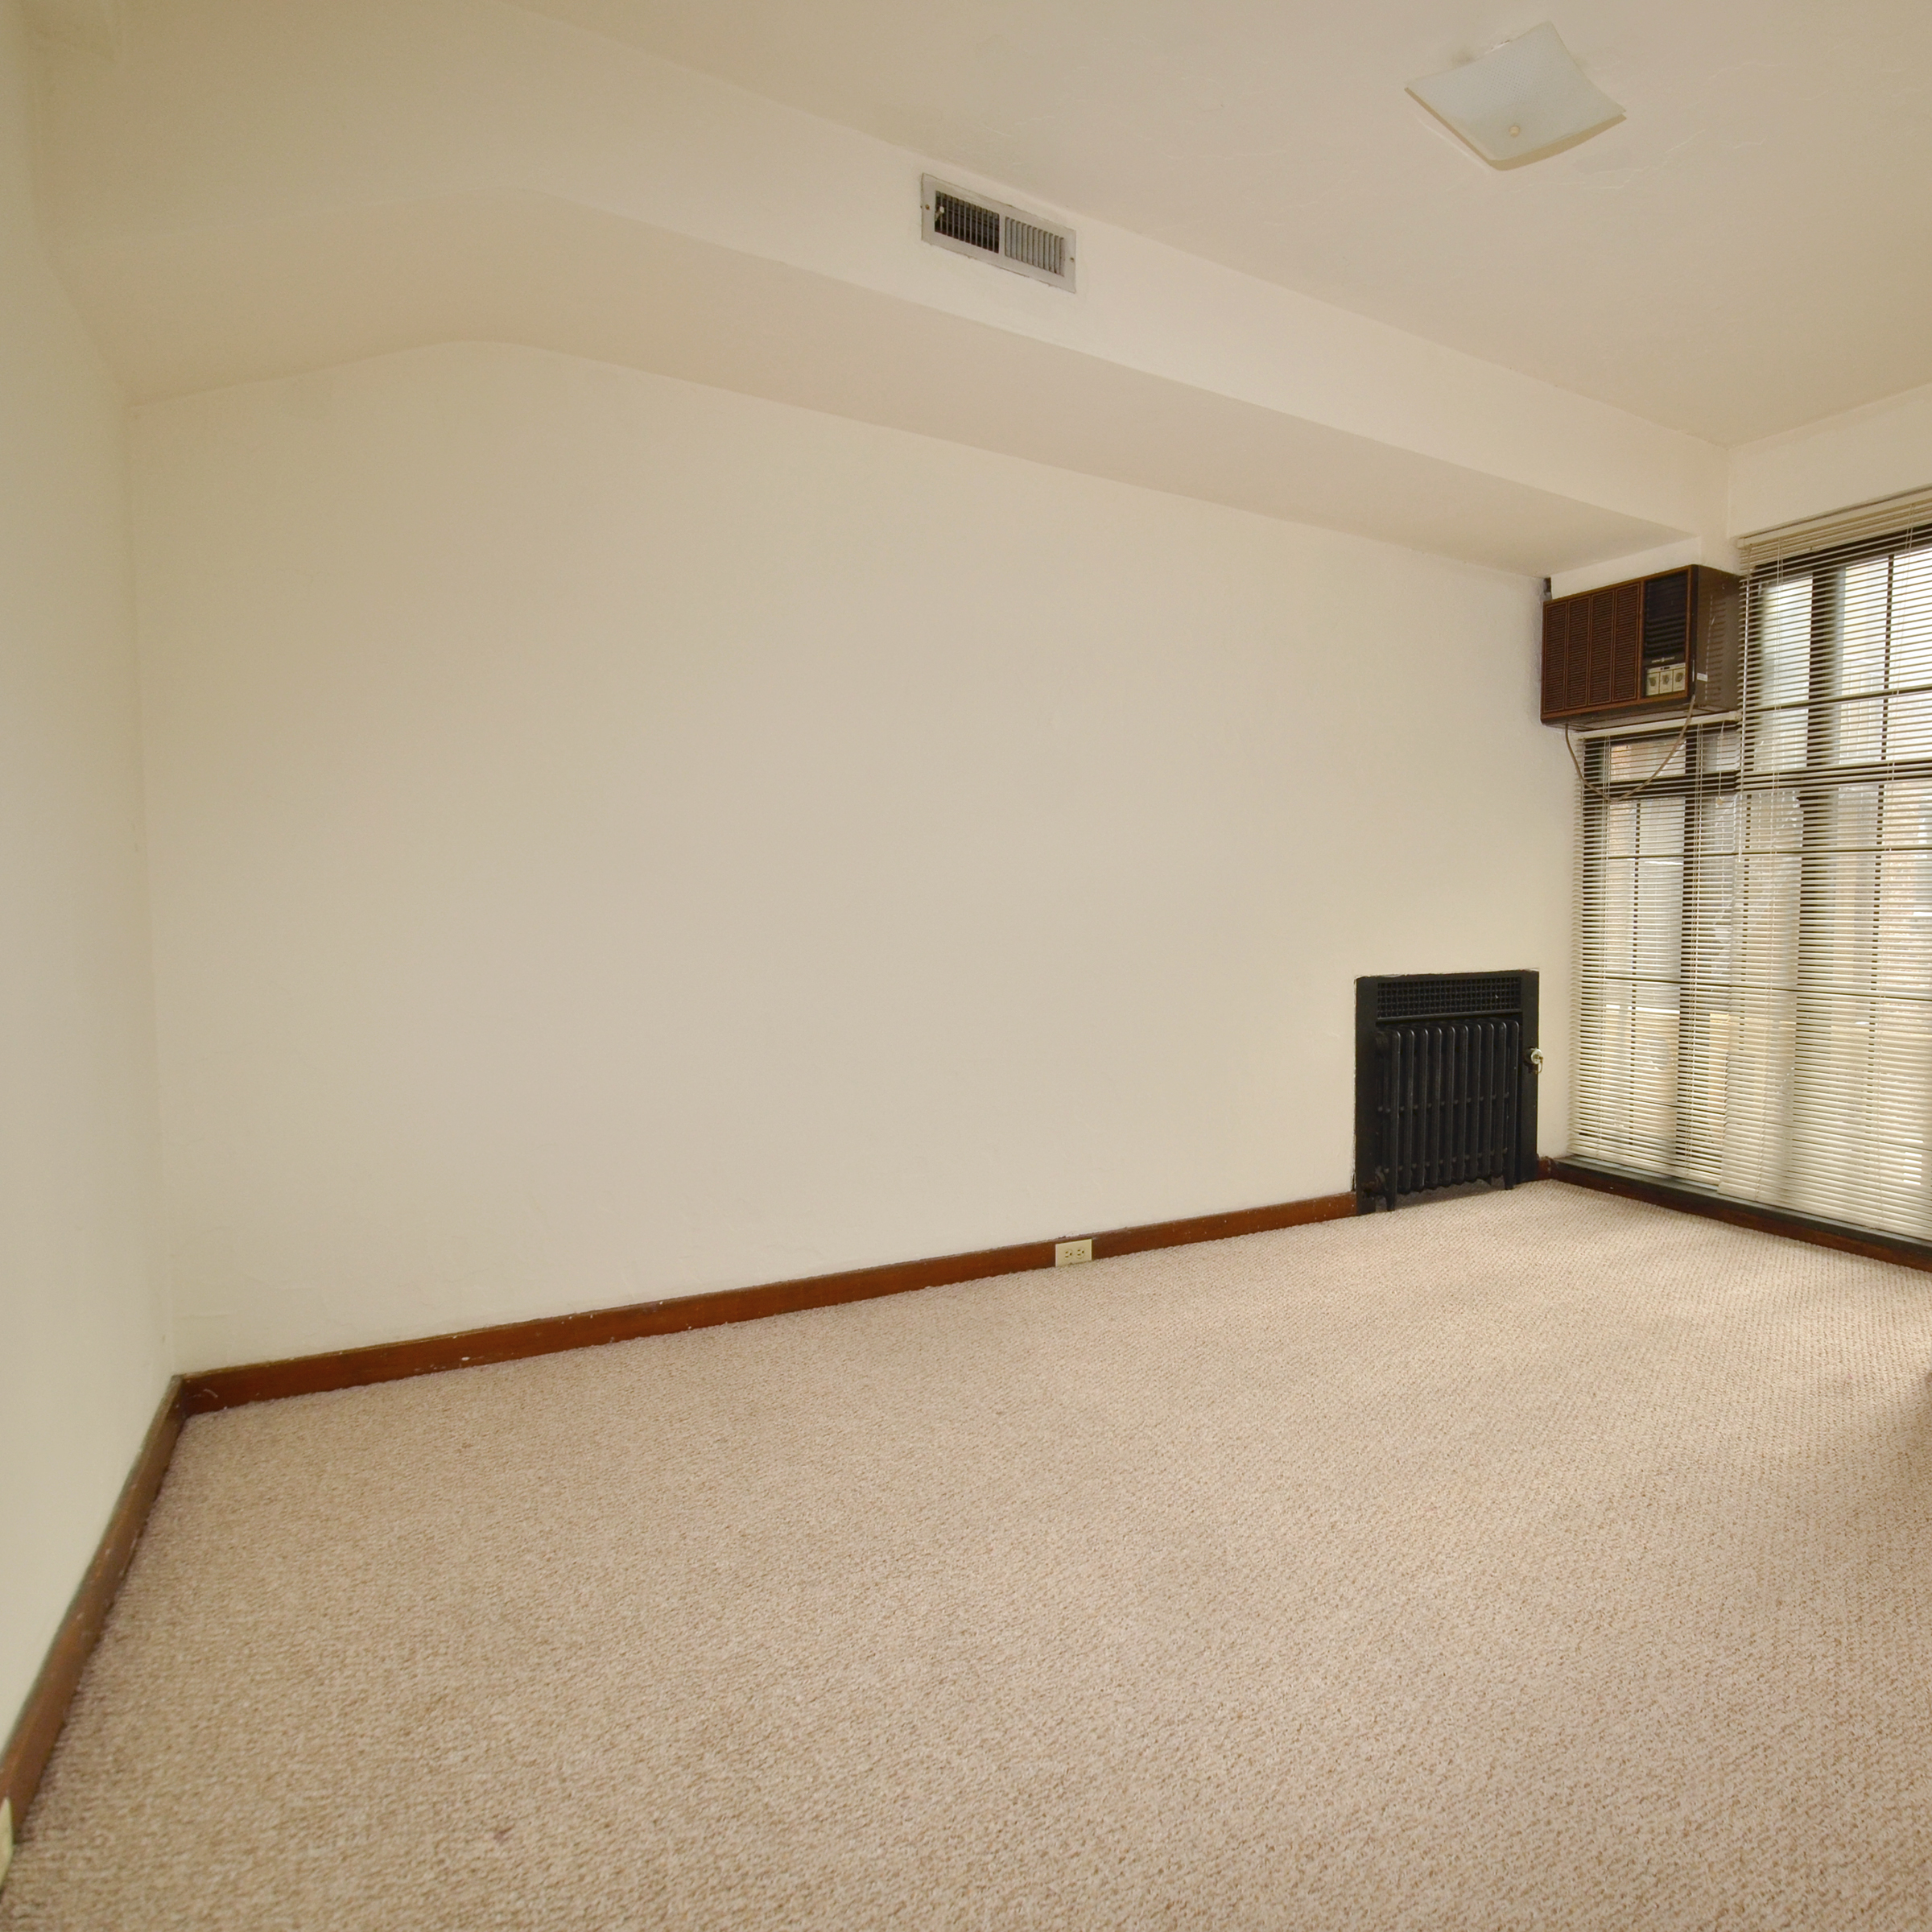 interior of 340 S. Highland Ave, Apt. 4A 5